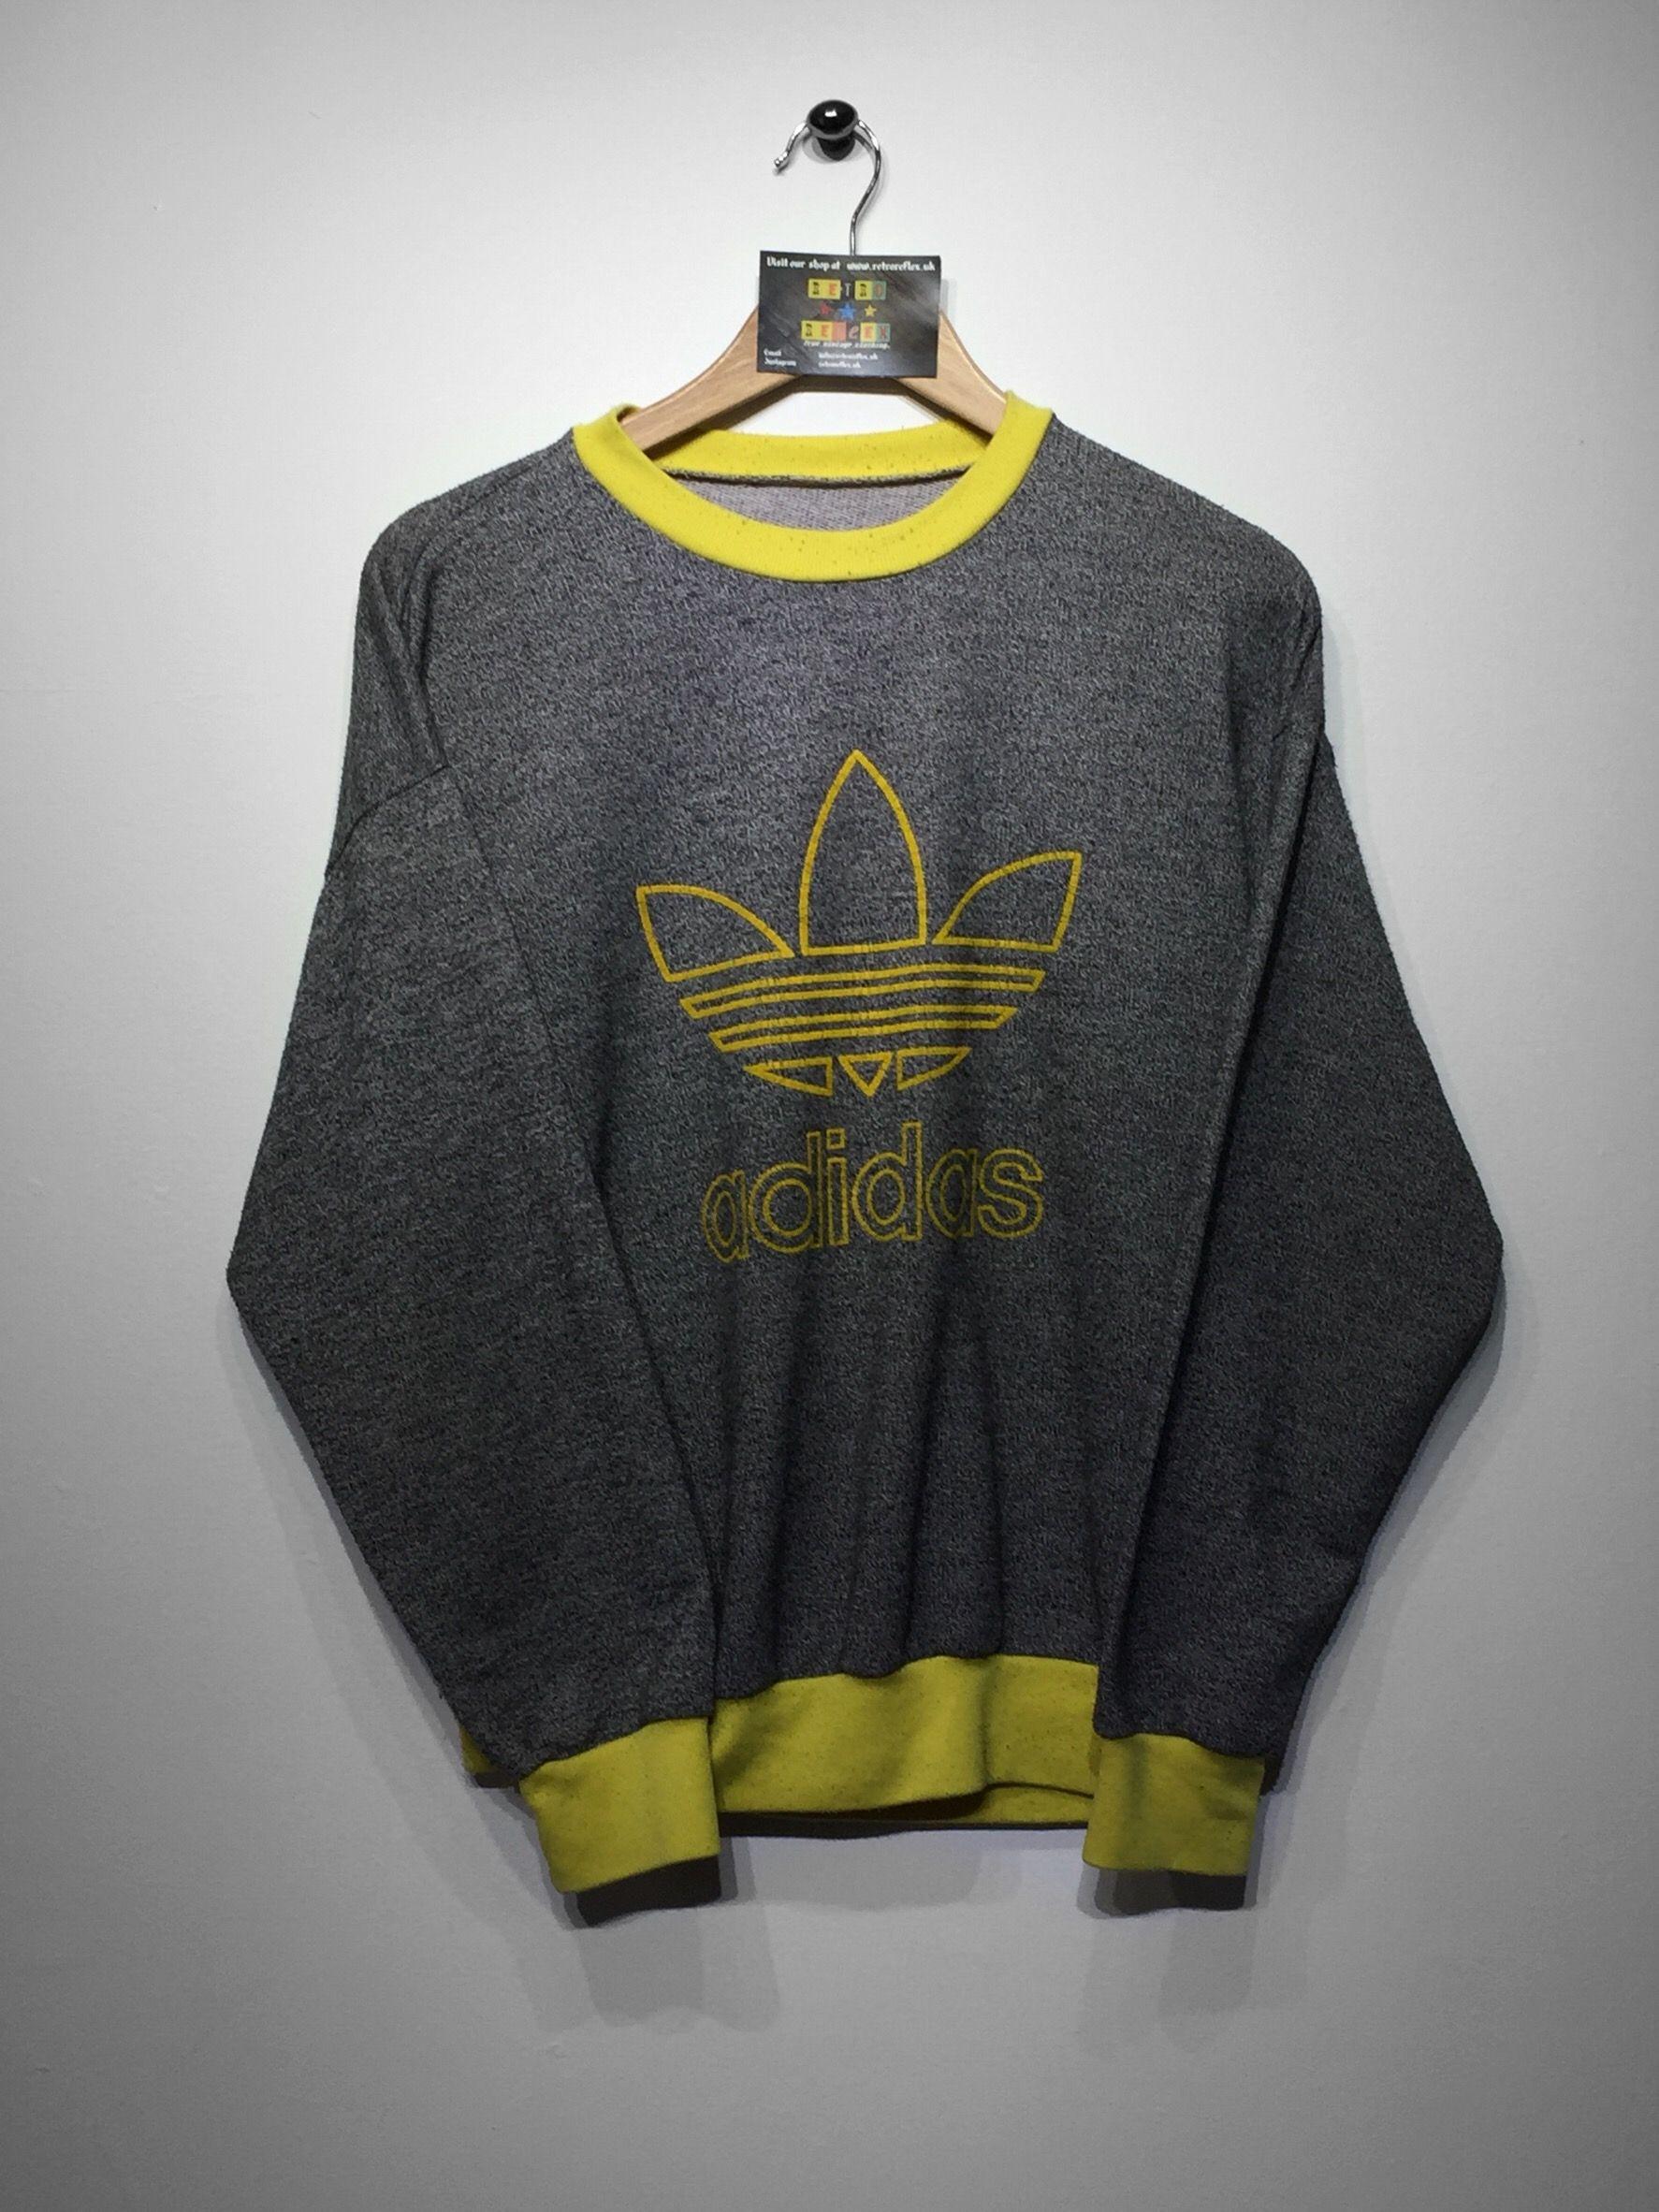 Adidas sweatshirt size Small £32 Website➡️ retroreflex